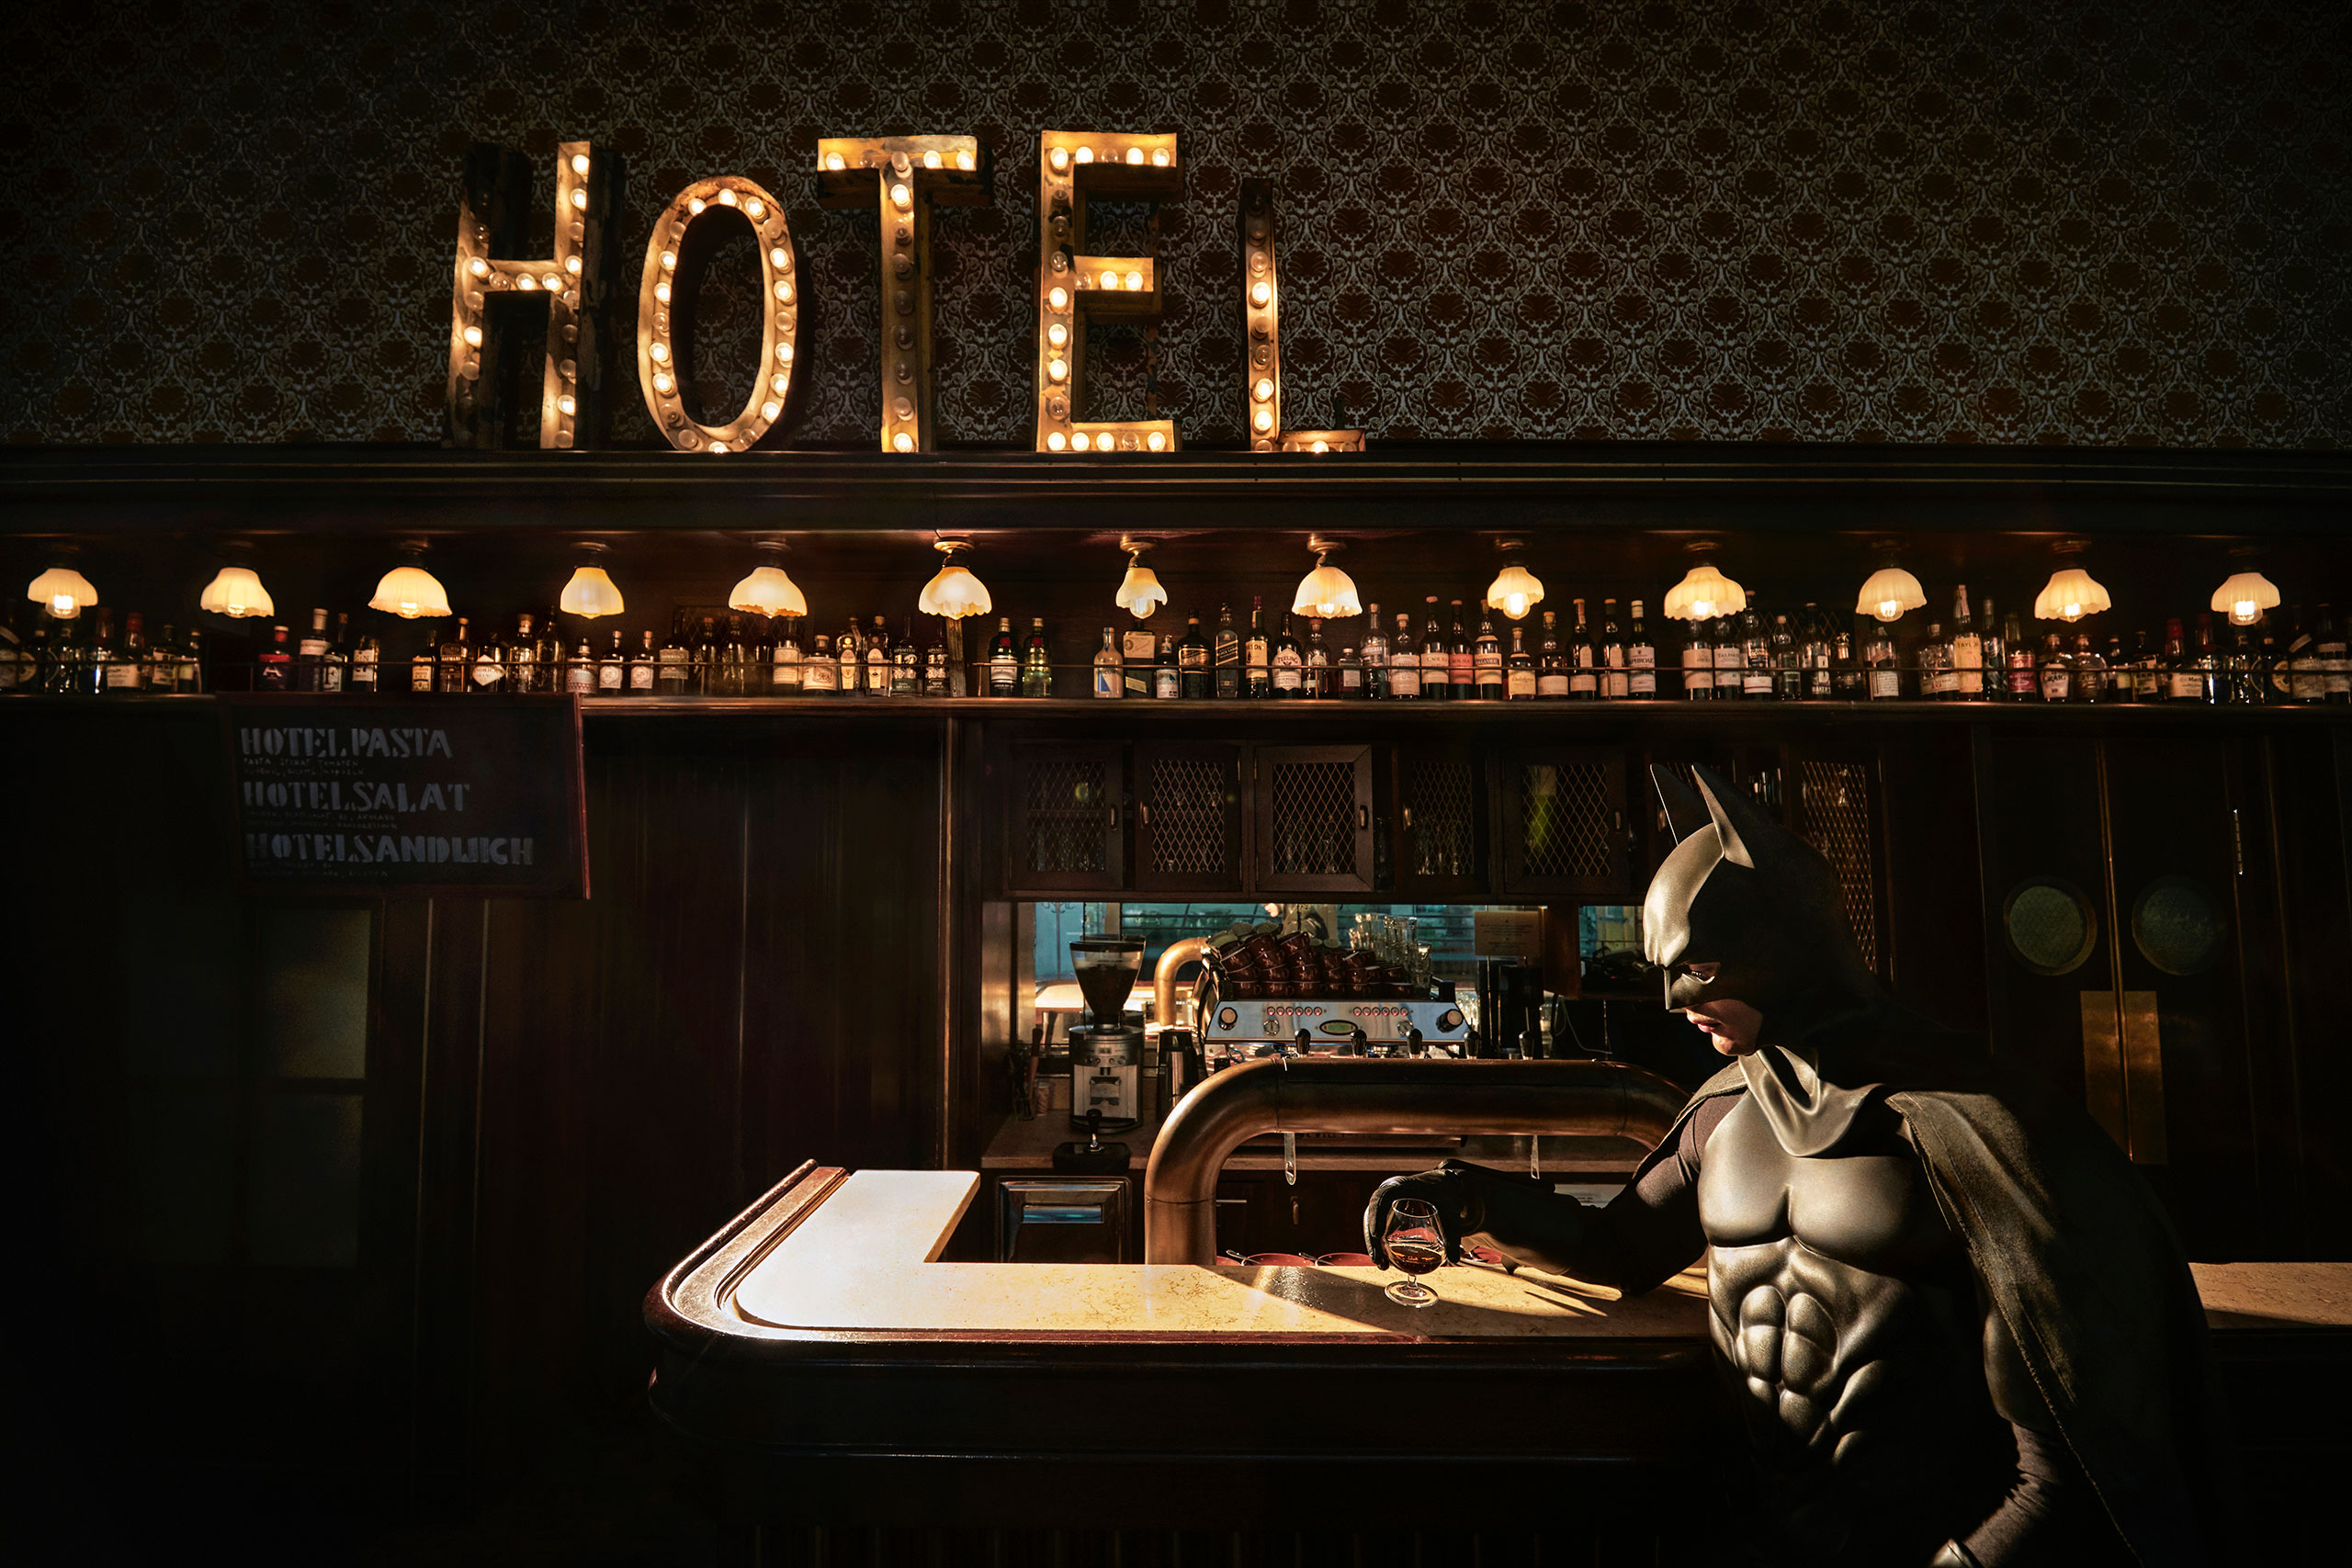 Daily Bat - Just a Drink. Photography by Sebastian Magnani.